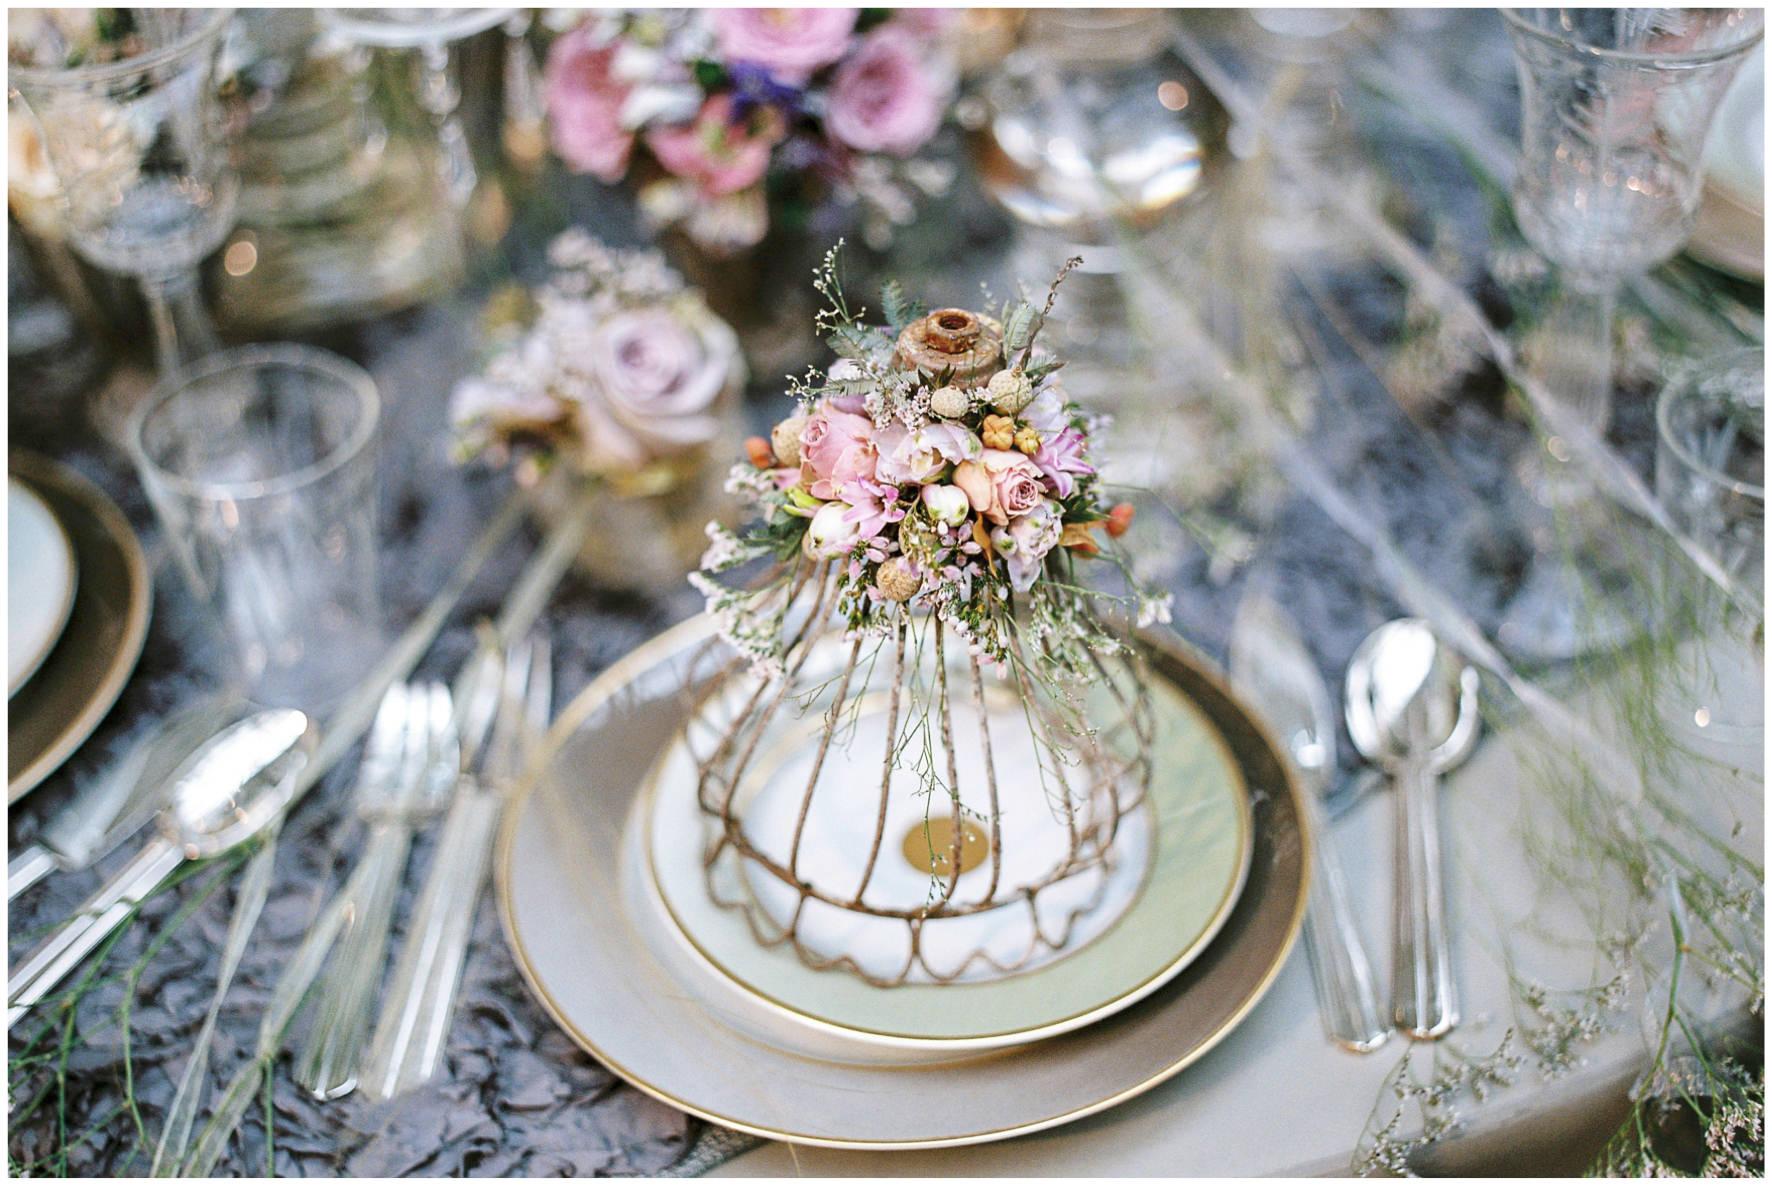 Lucy Davenport Photography, Zita Elze, floral details, Zita Elze Flowers, floral tips